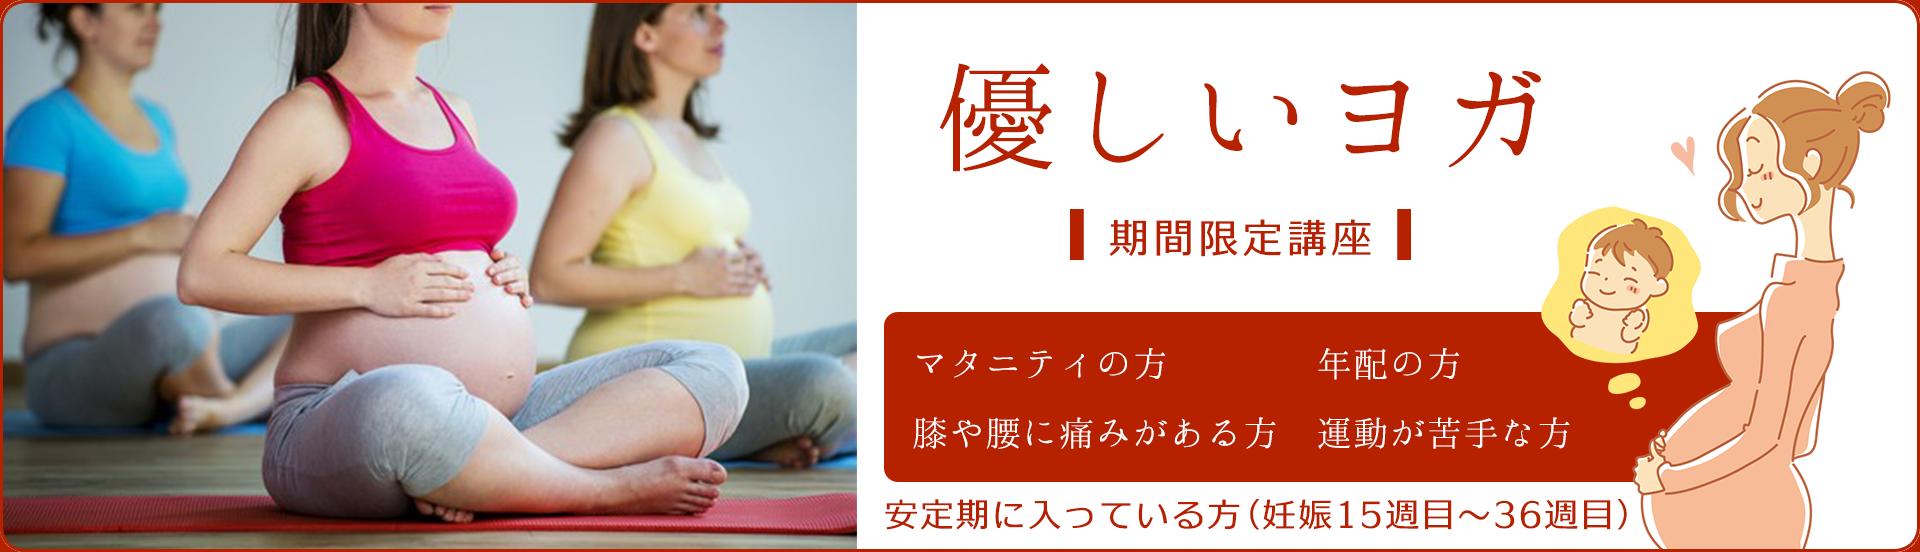 Maternity Yoga マタニティヨガクラスSTART!!安産に向けて妊娠中の心と体の安定を目指していきます。